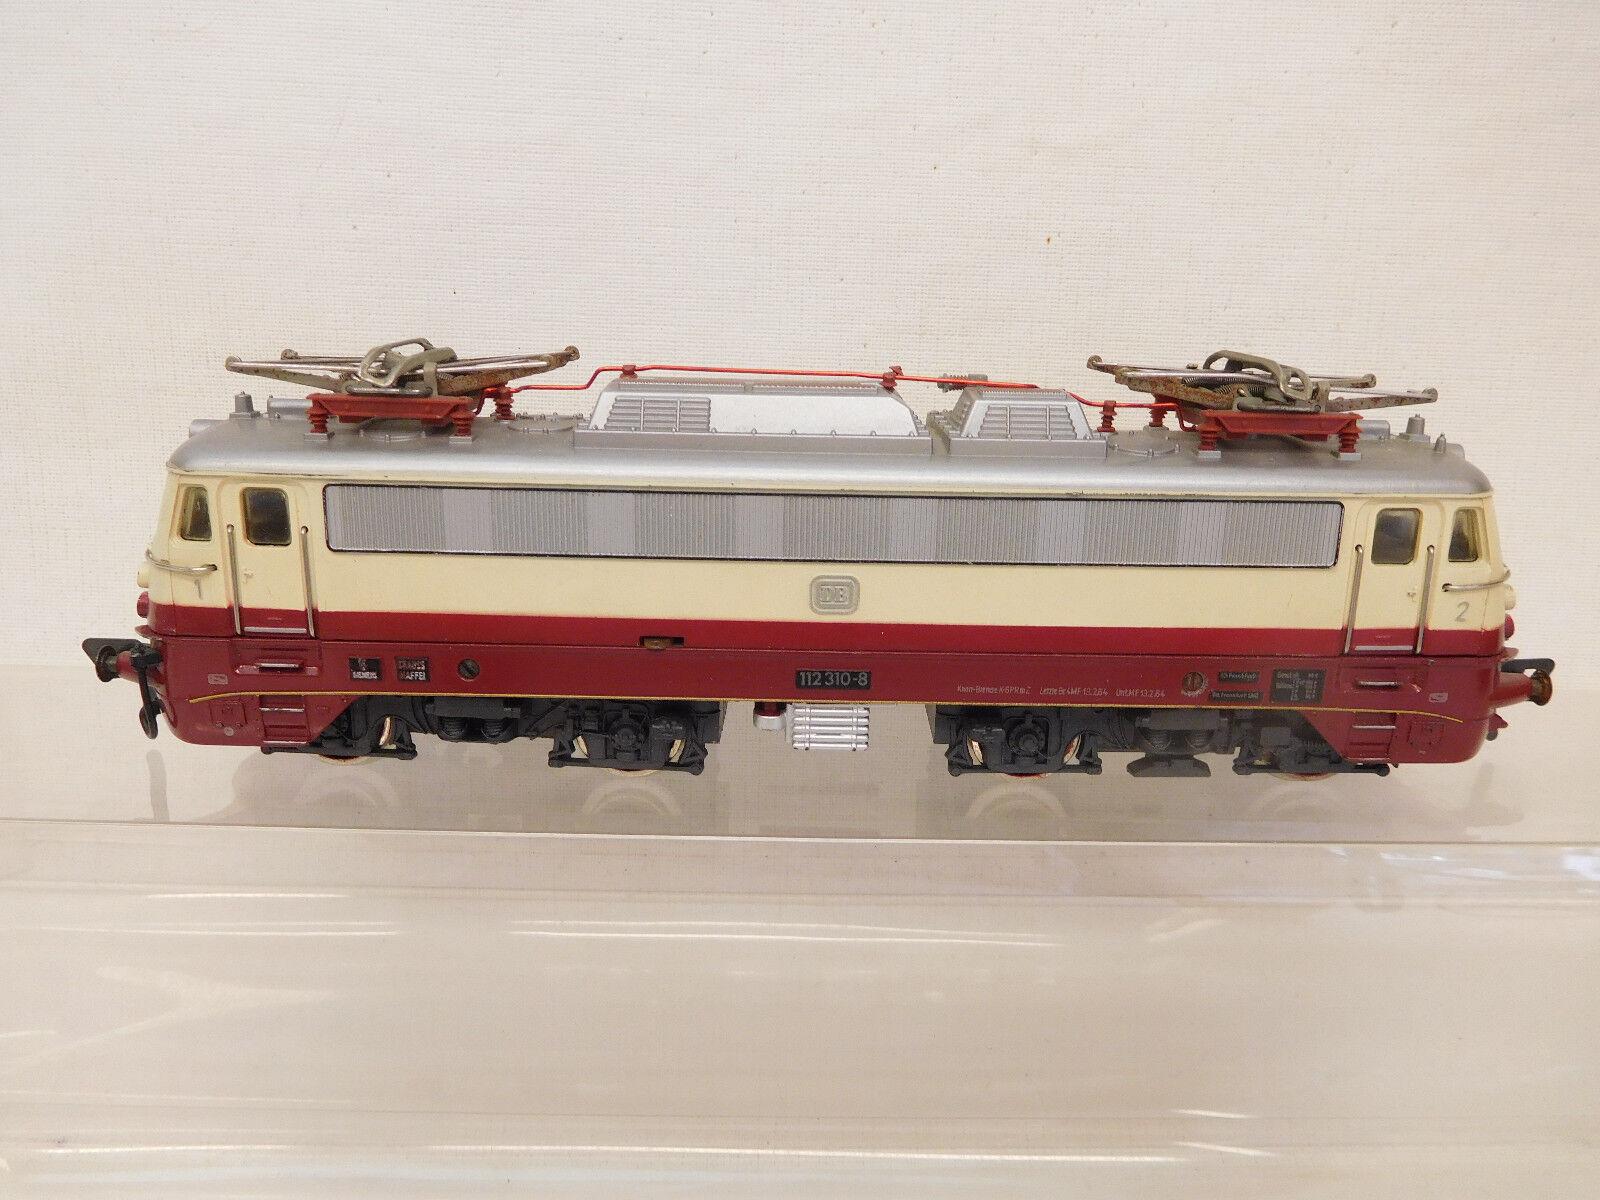 Esf-04688 FLEICHMANN h0 E-Lok DB 112310-8, funzione testato